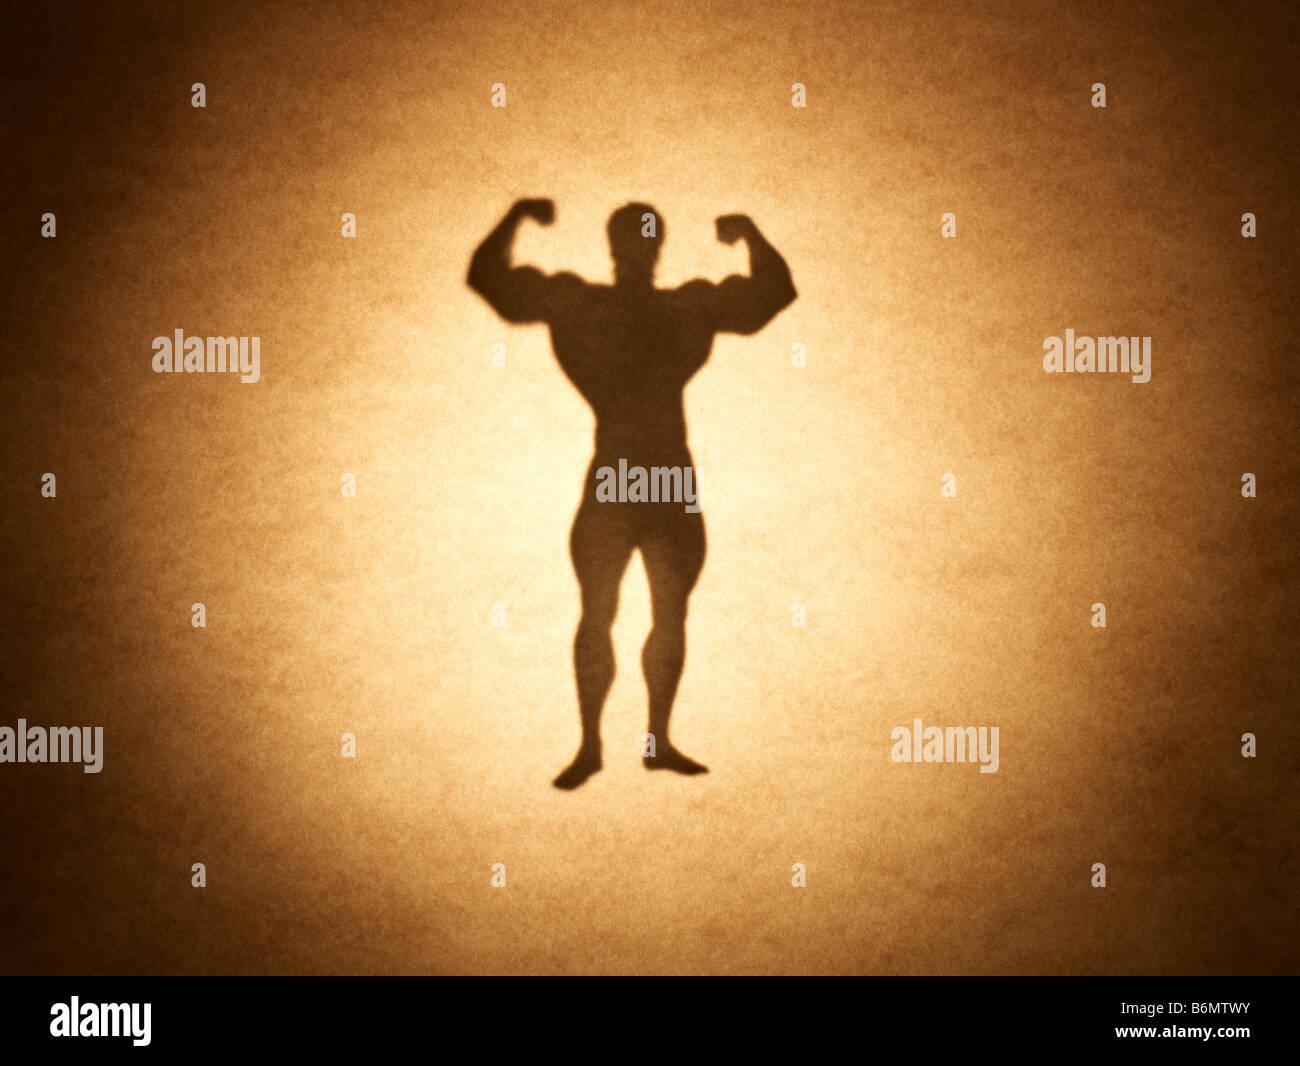 Body builder - Stock Image